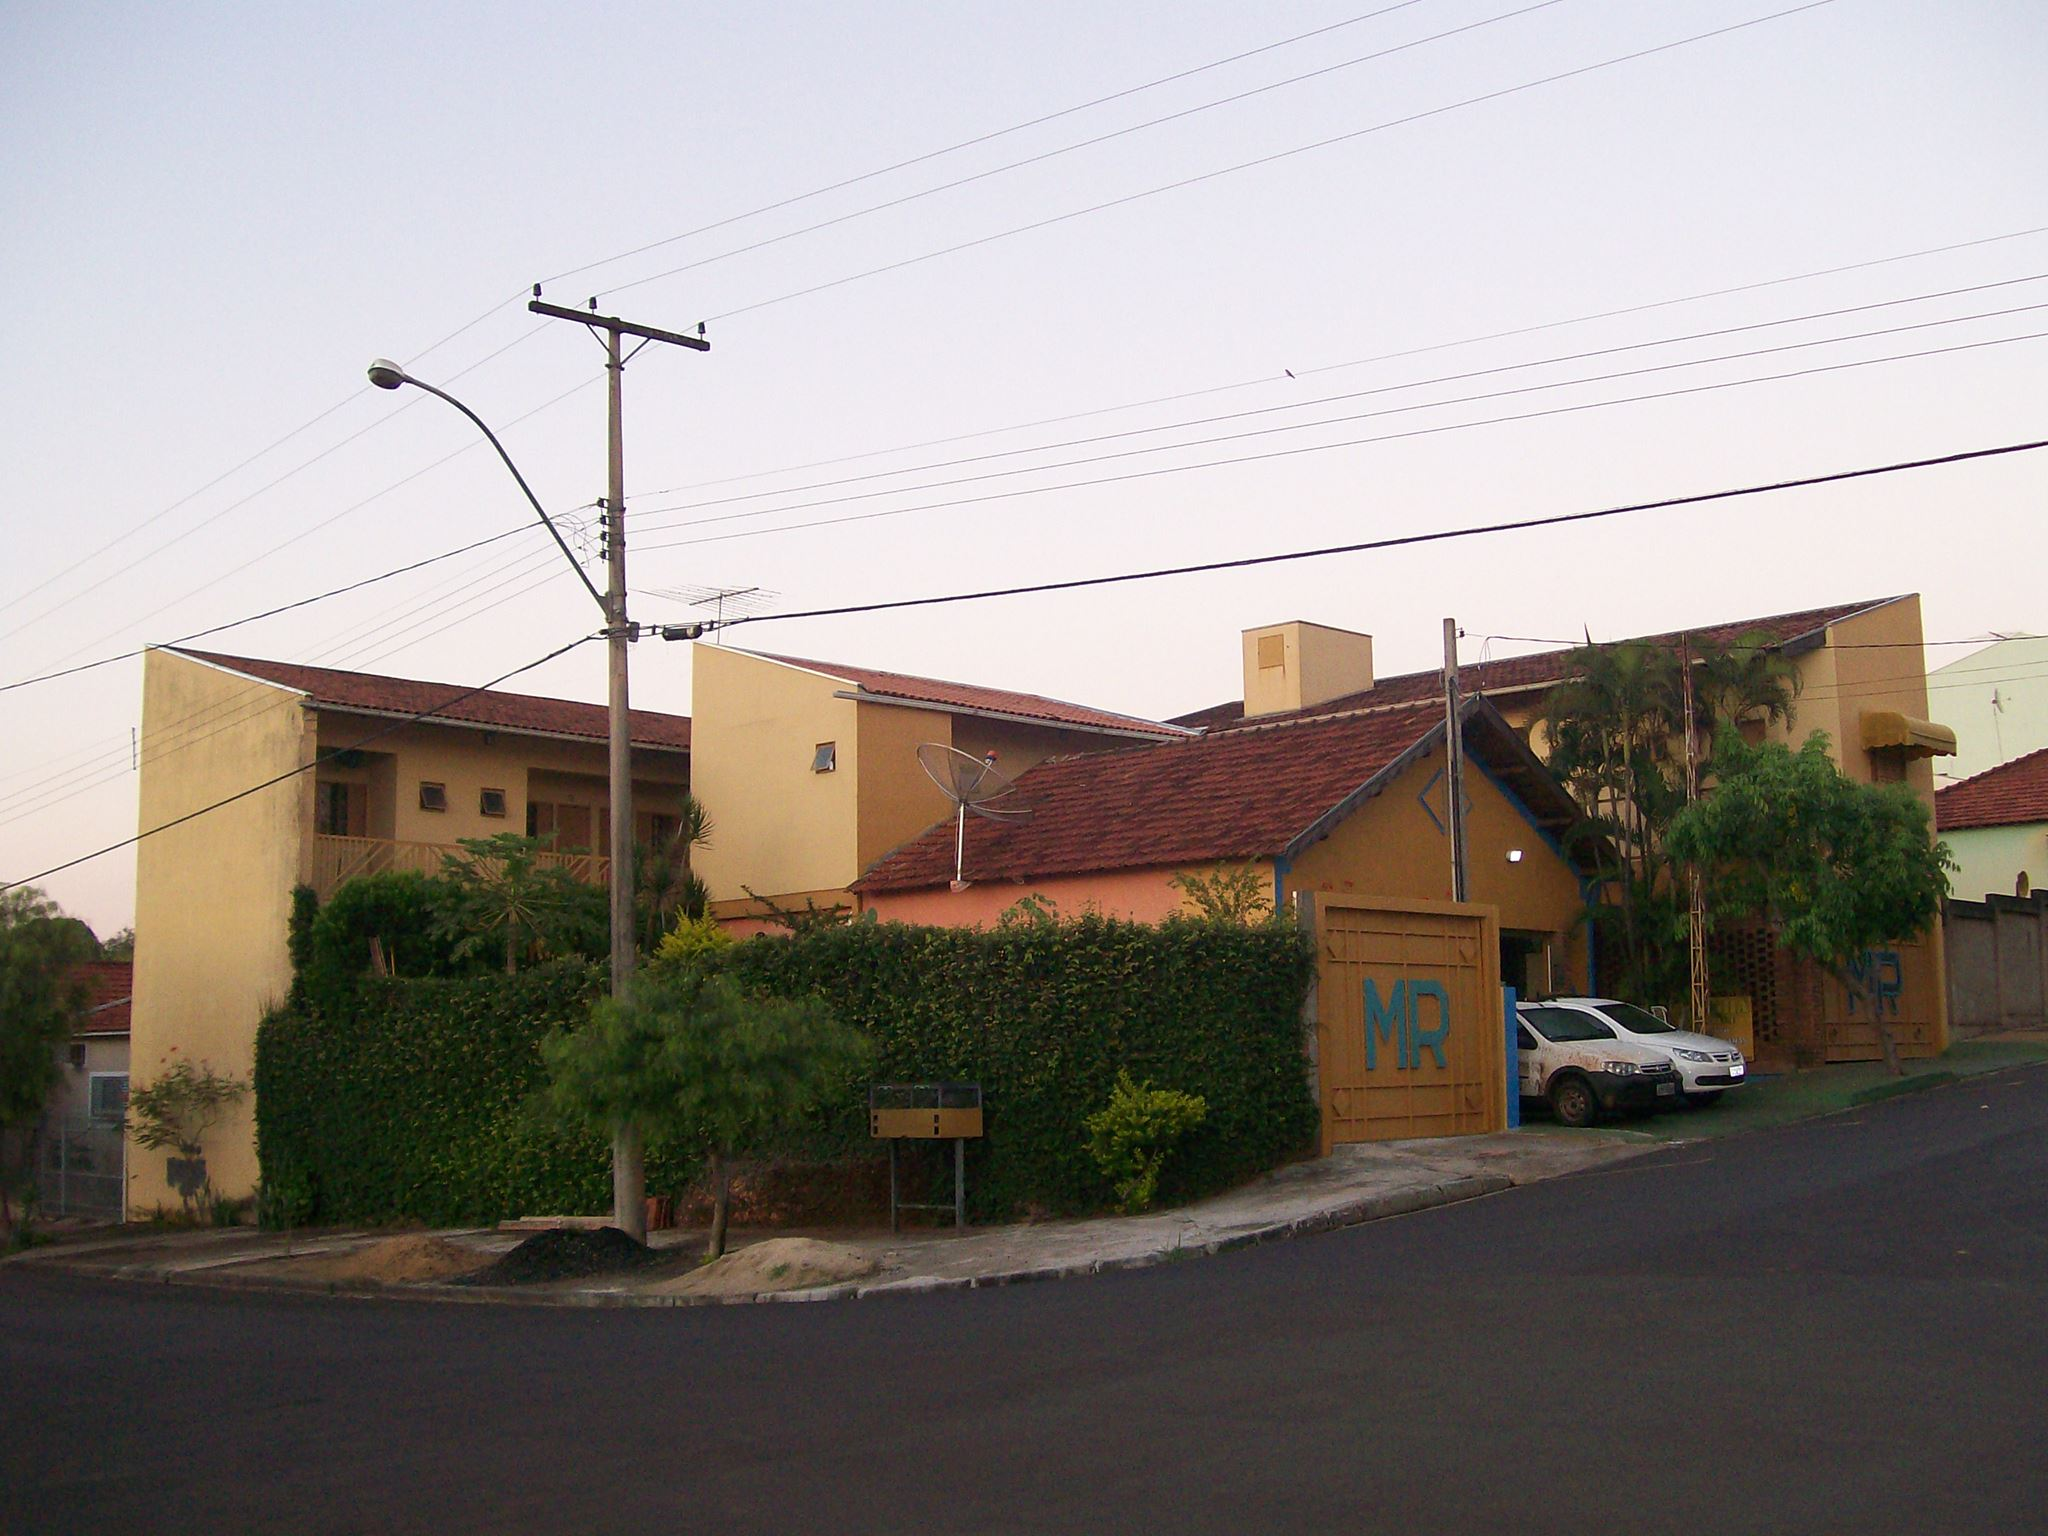 Hotel Mãe Rainha